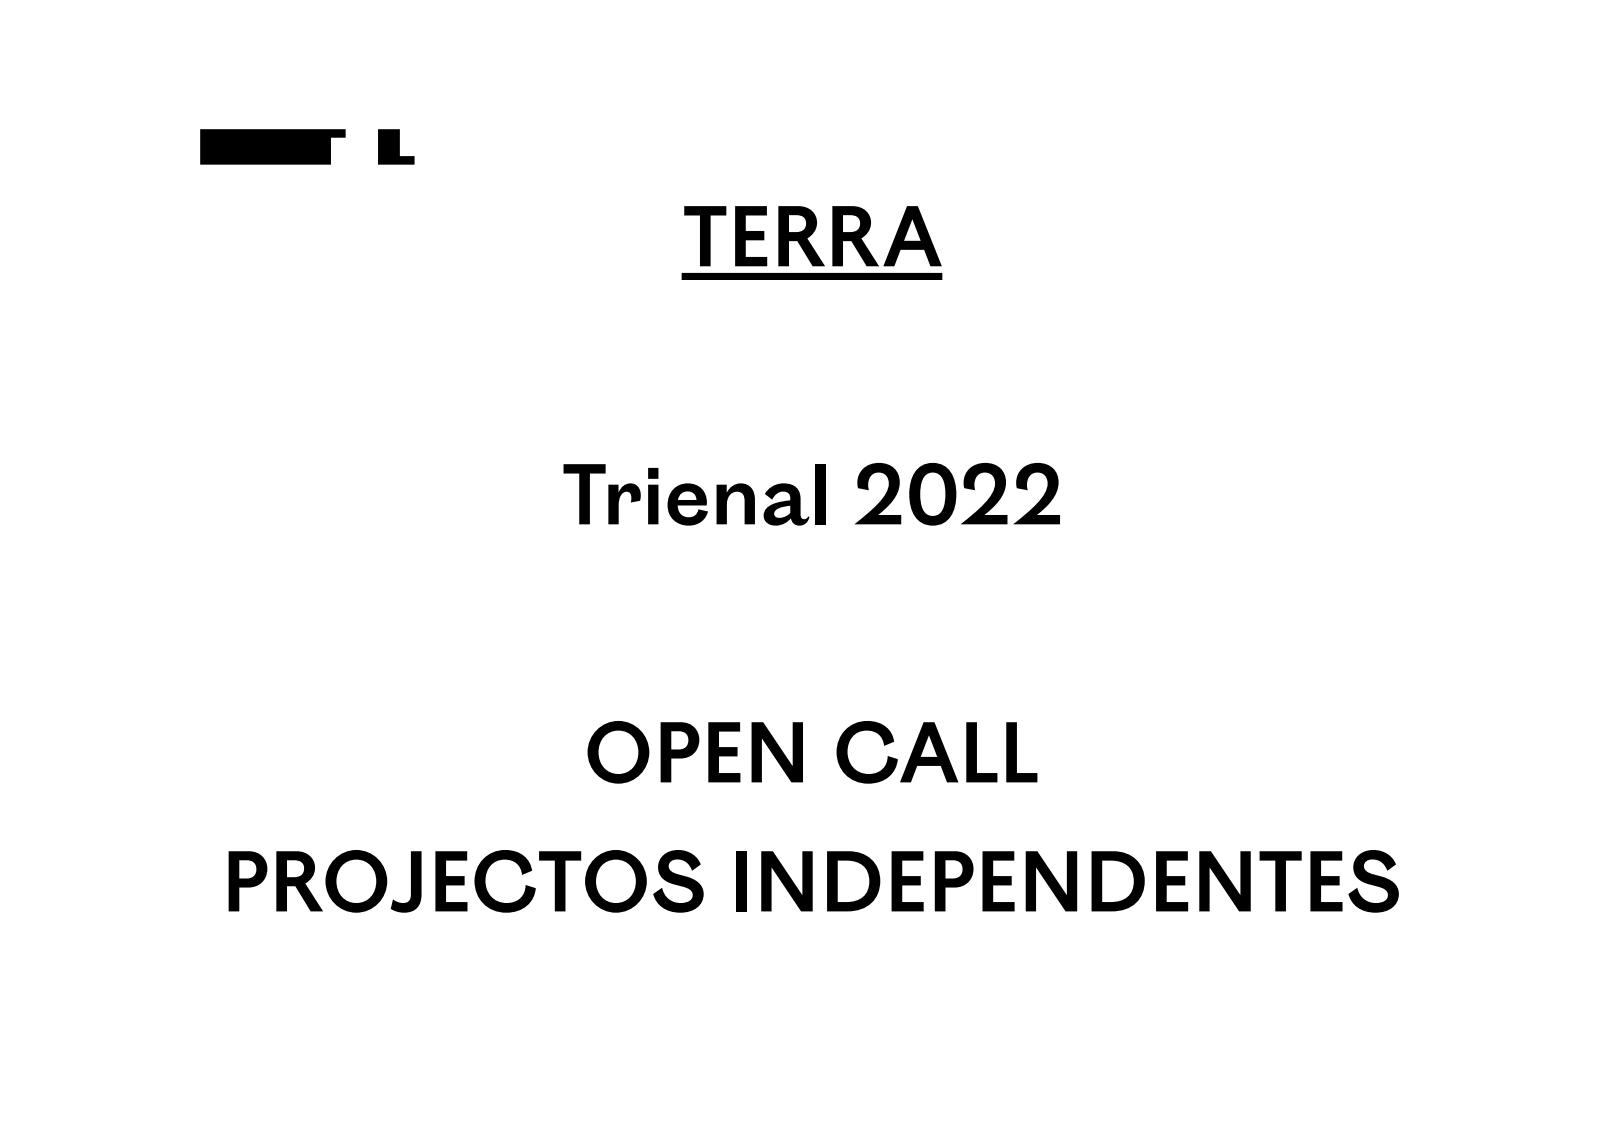 Projectos Independentes